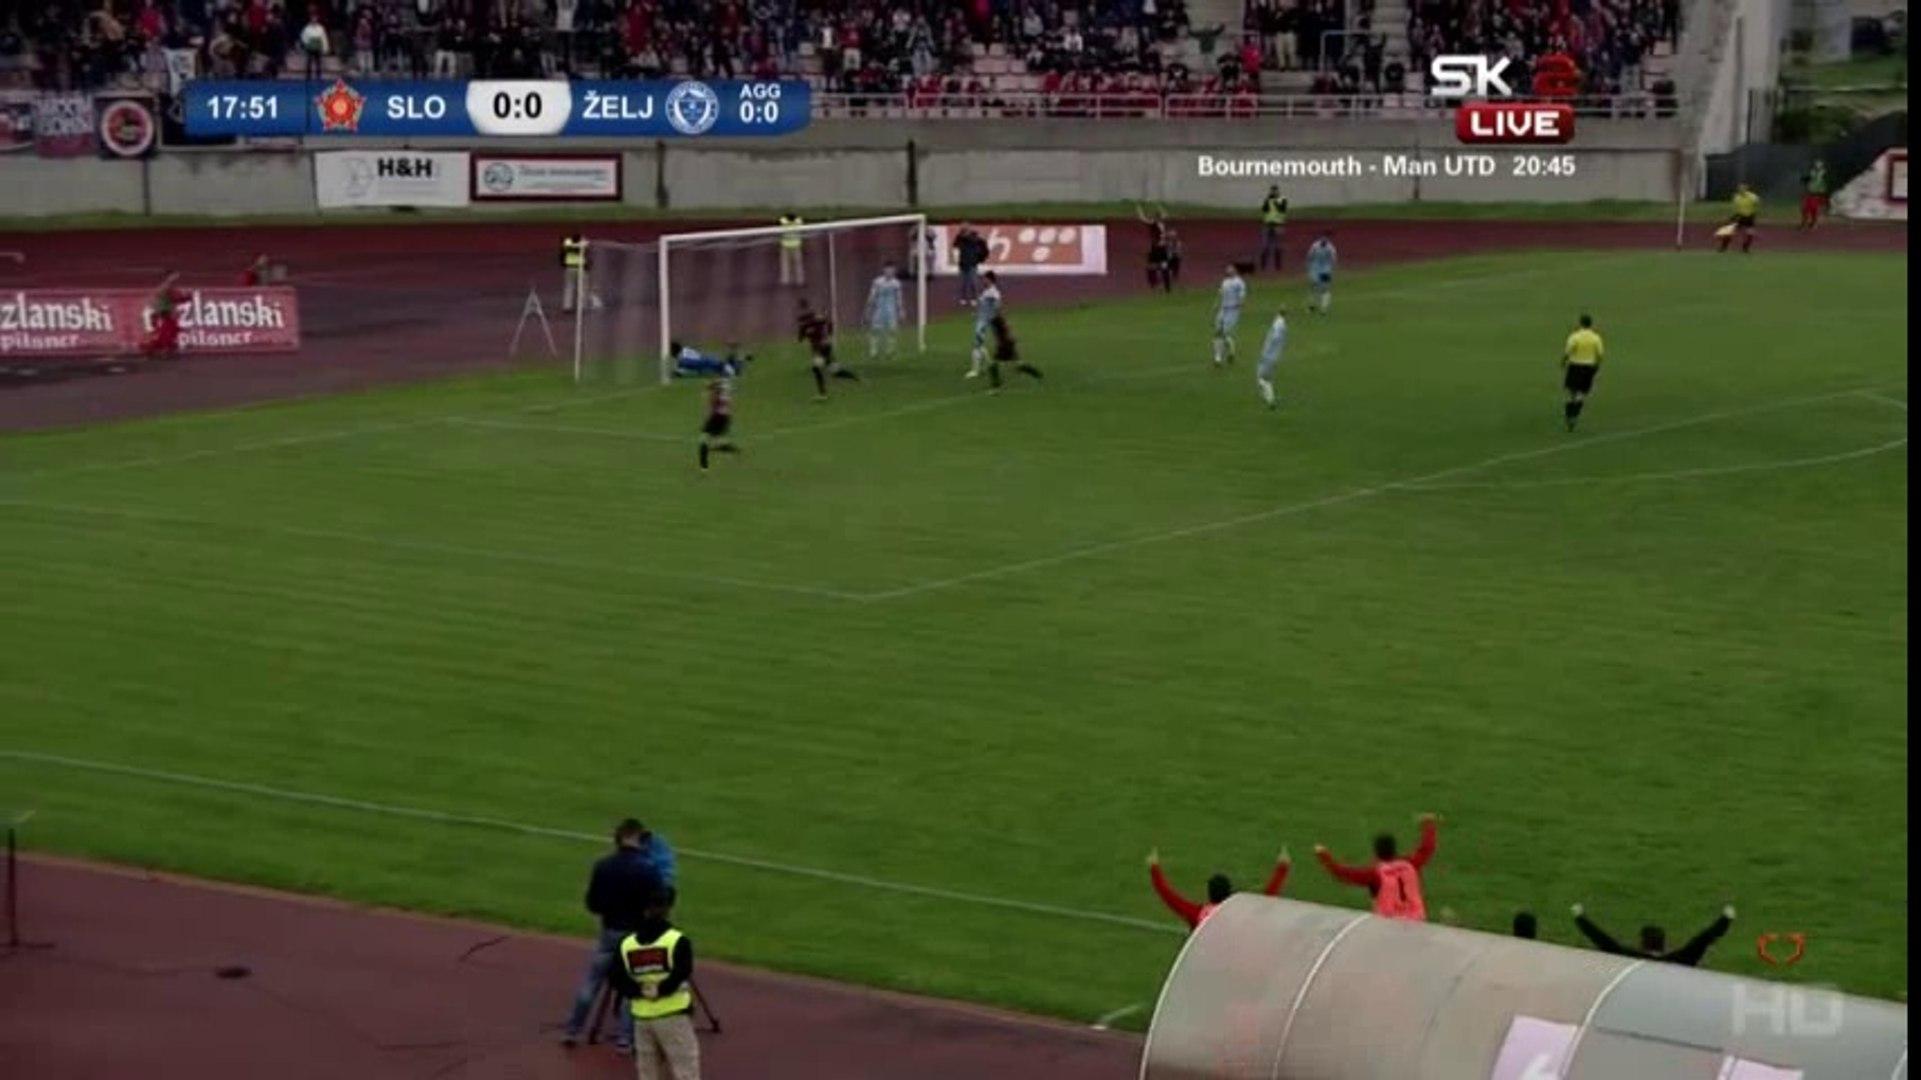 FK Sloboda - FK Željezničar 1:4 (0:0) [Kup] [Golovi]